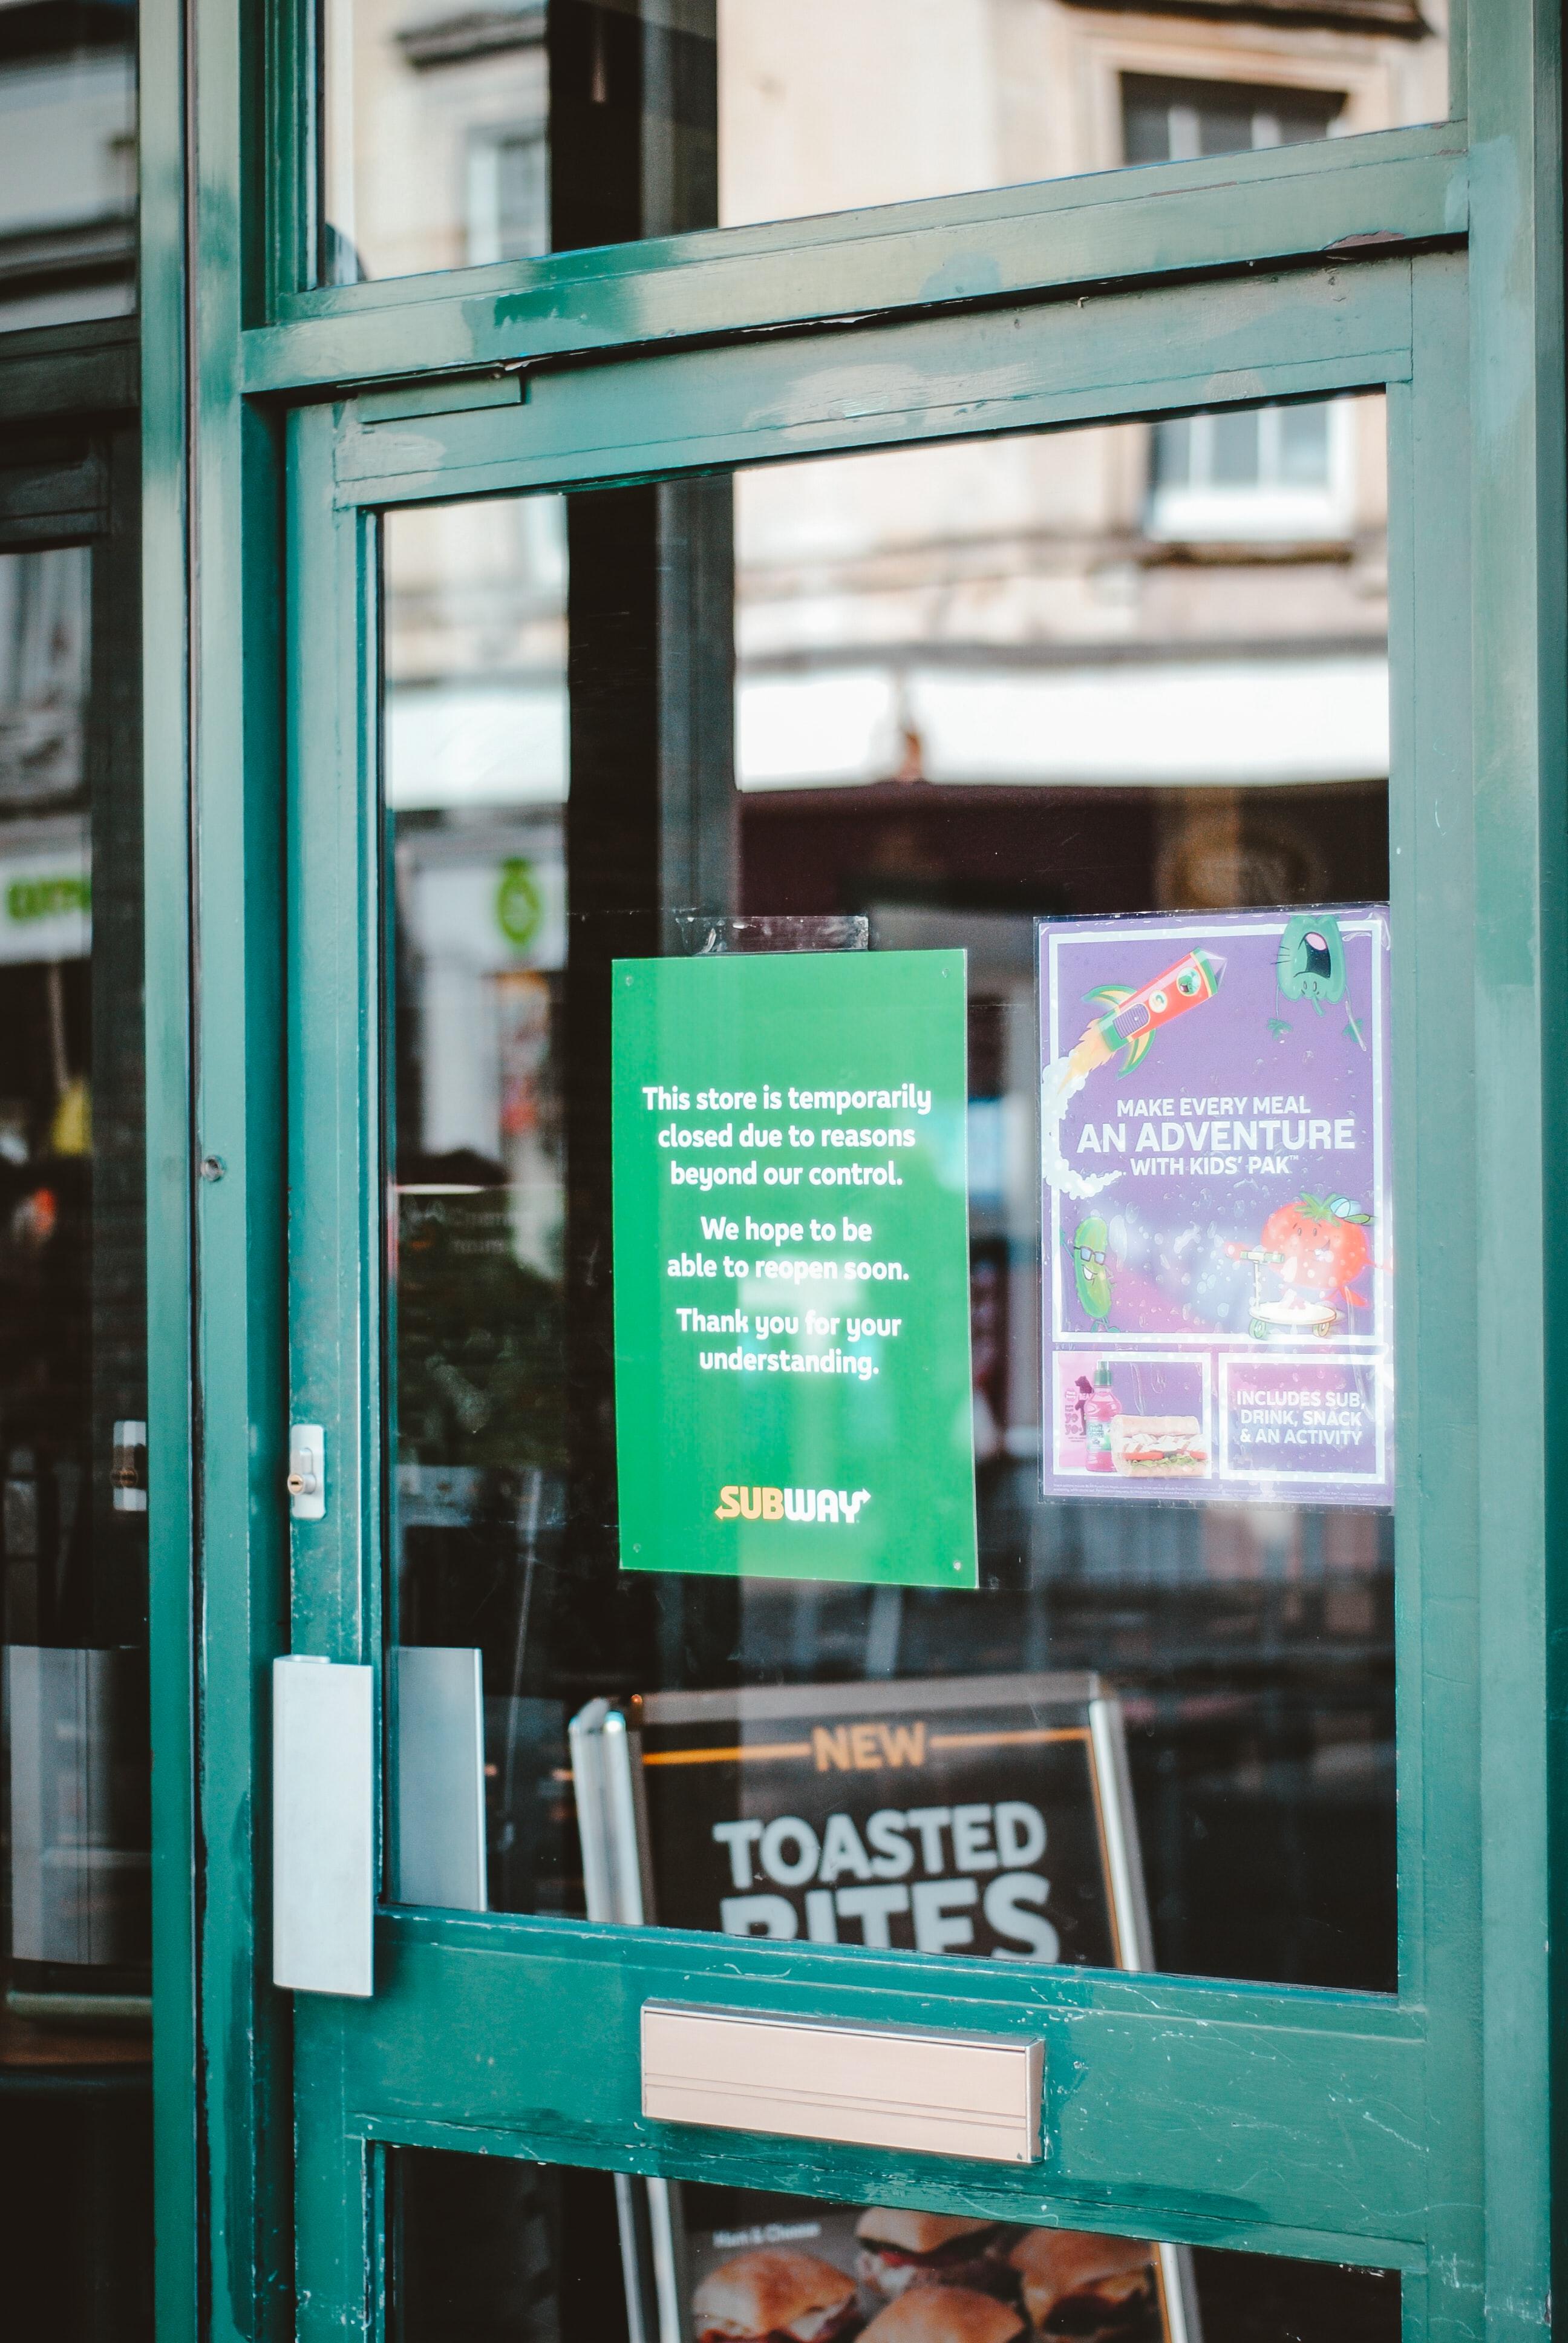 Subway Restaurant Sign Closed